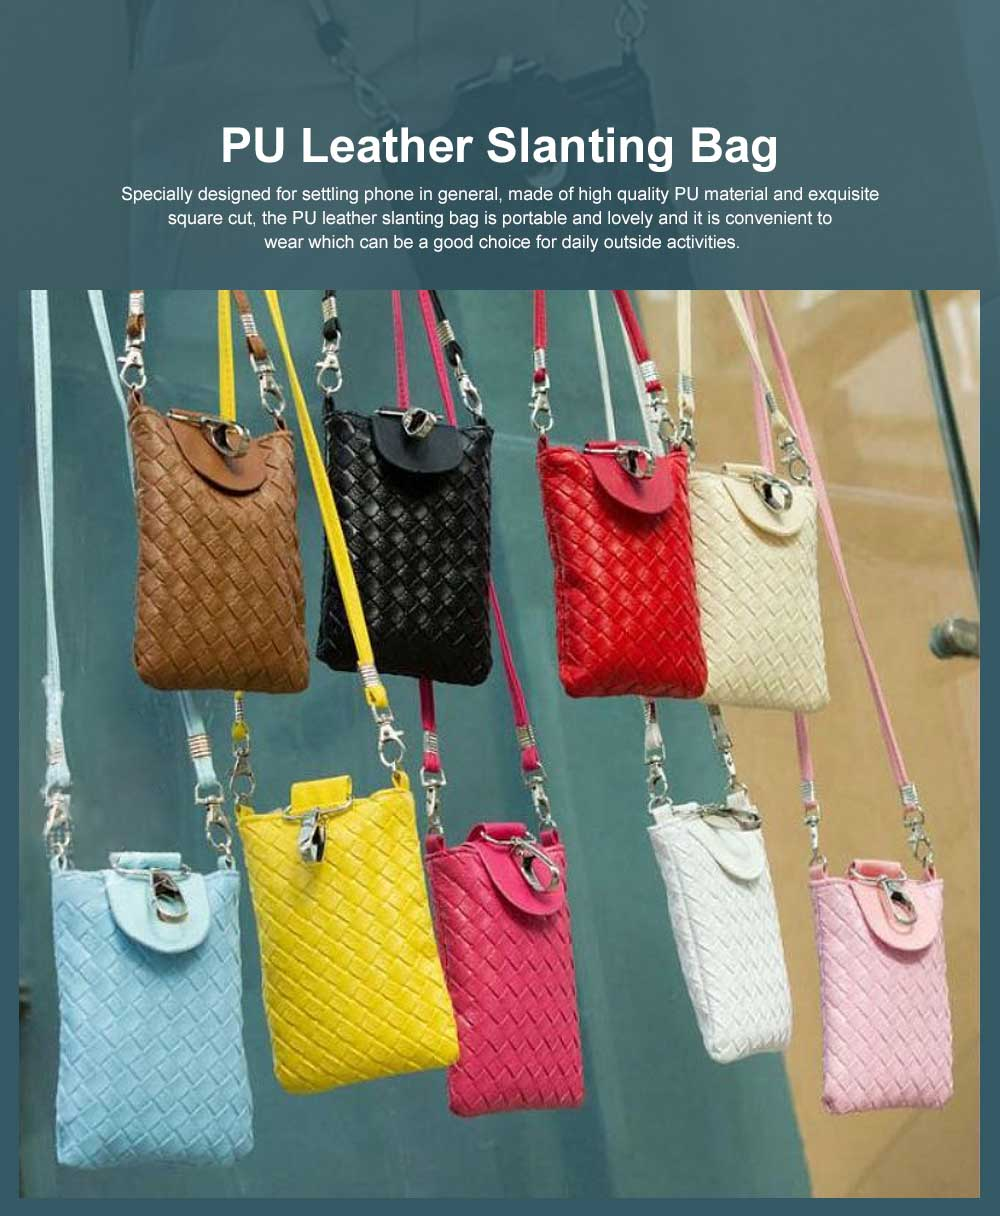 Mini Diagonal Mobile Phone Shoulder Bag, Woven PU Leather Small Slanting Bag for Phone, Cash, Card, Coins, Mini Casual Shoulder Bag 0